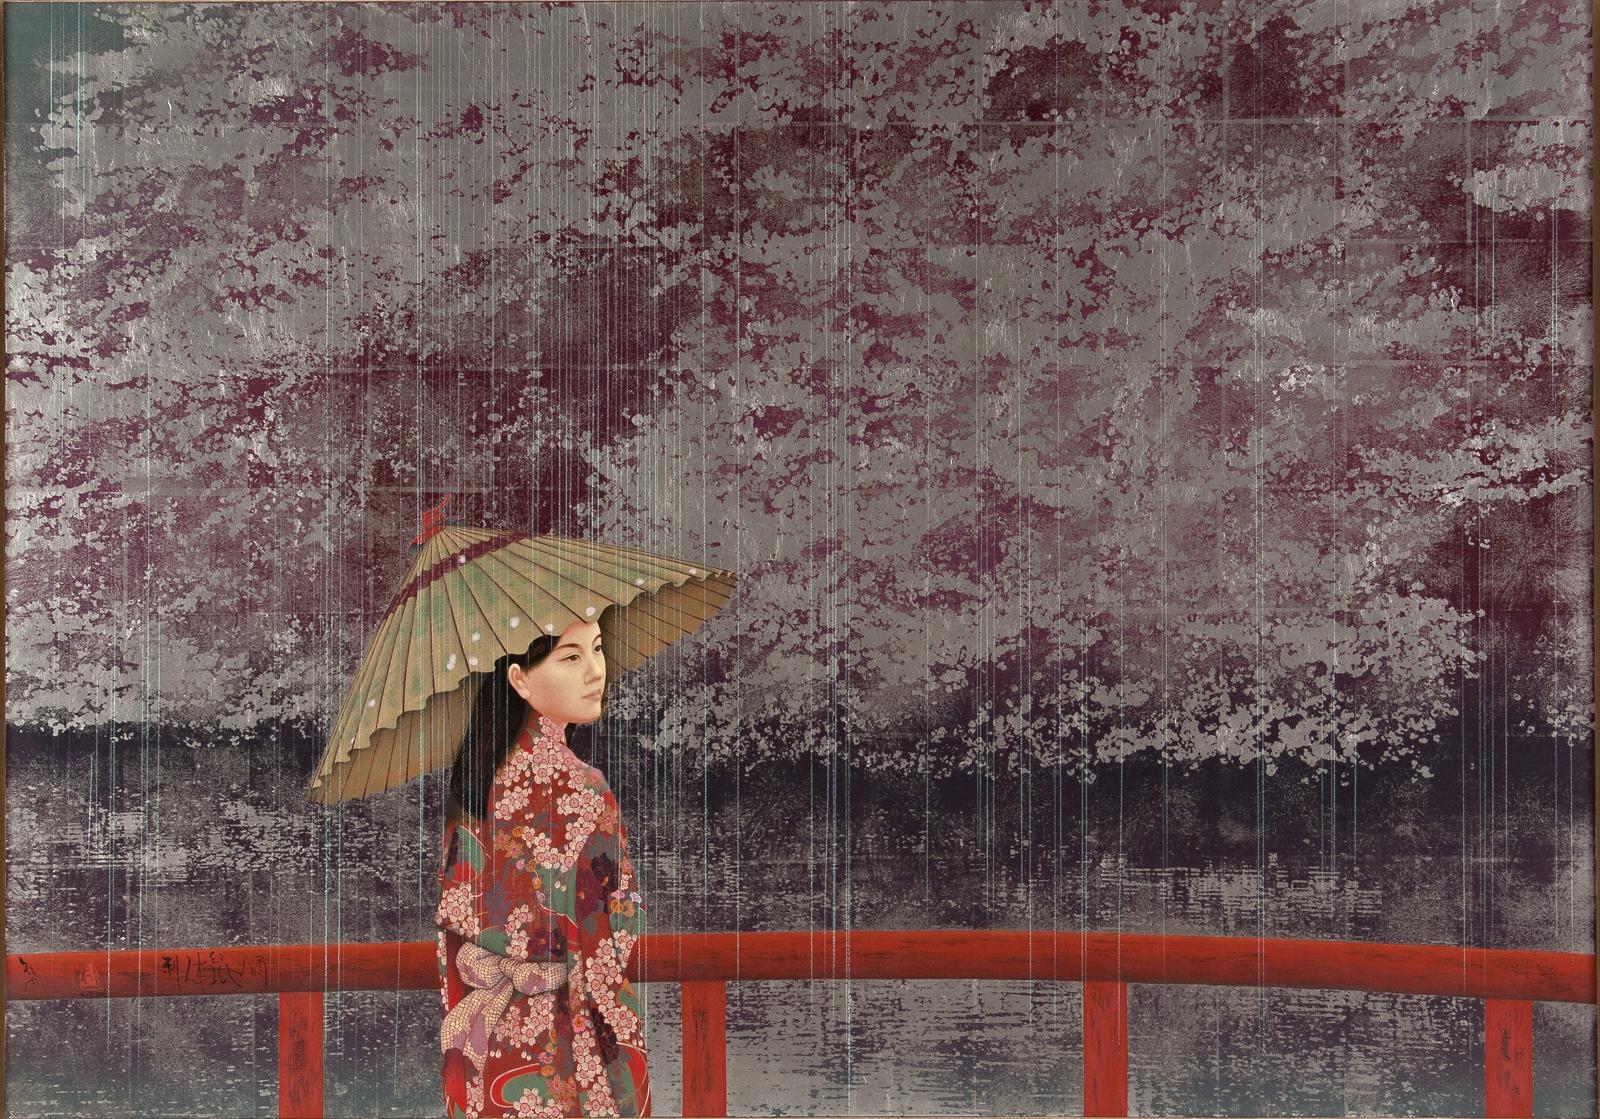 Kyosuke Tchinai for Elena Shchukina Gallery